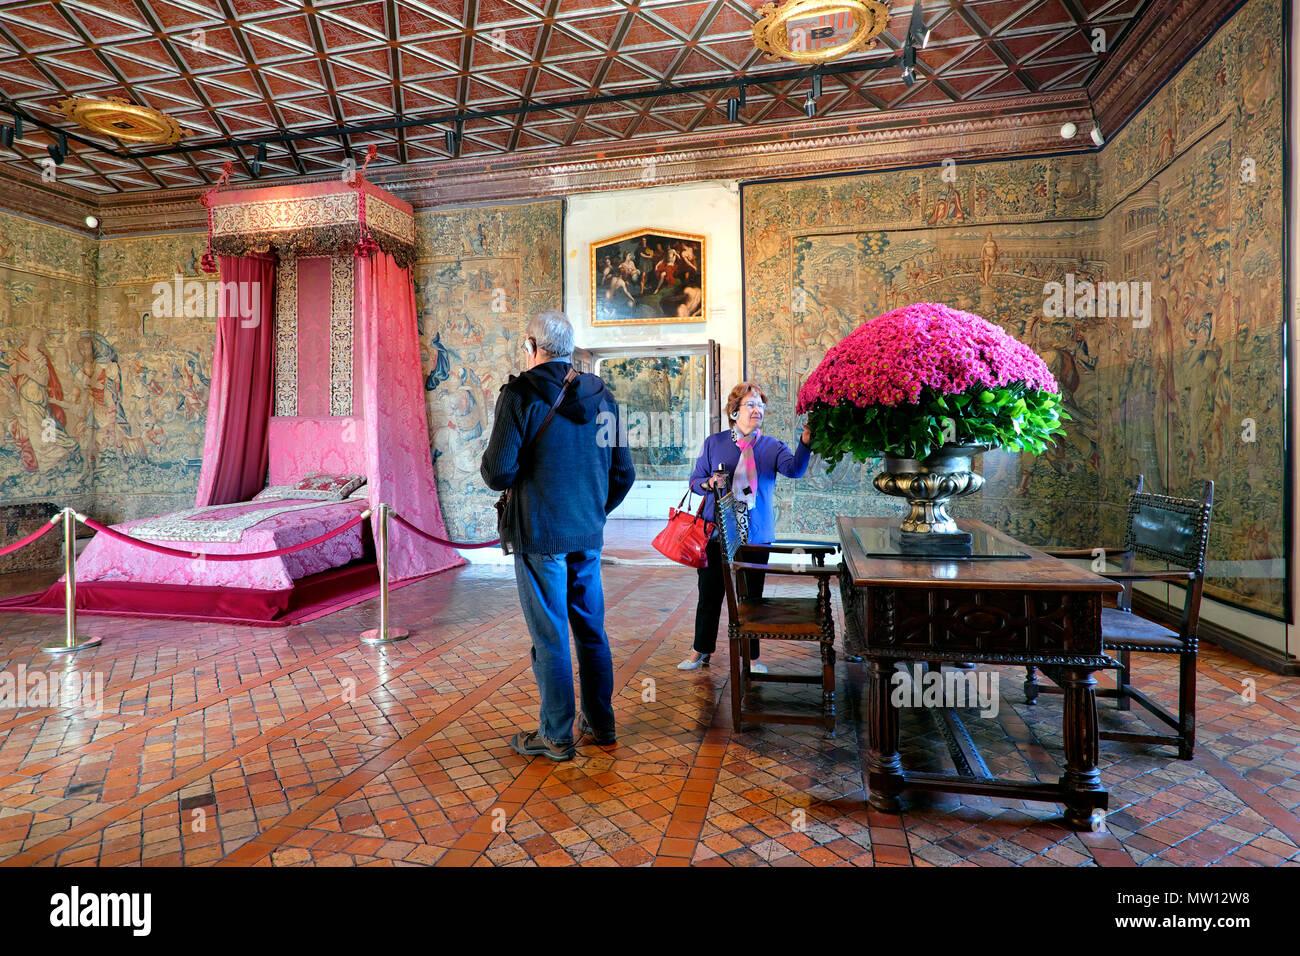 Los Cinco Queen's dormitorio / Chambre des Cinq reines, Château de Chenonceau, Chenonceaux, Valle del Loira, Center-Val de Loire, Francia Imagen De Stock